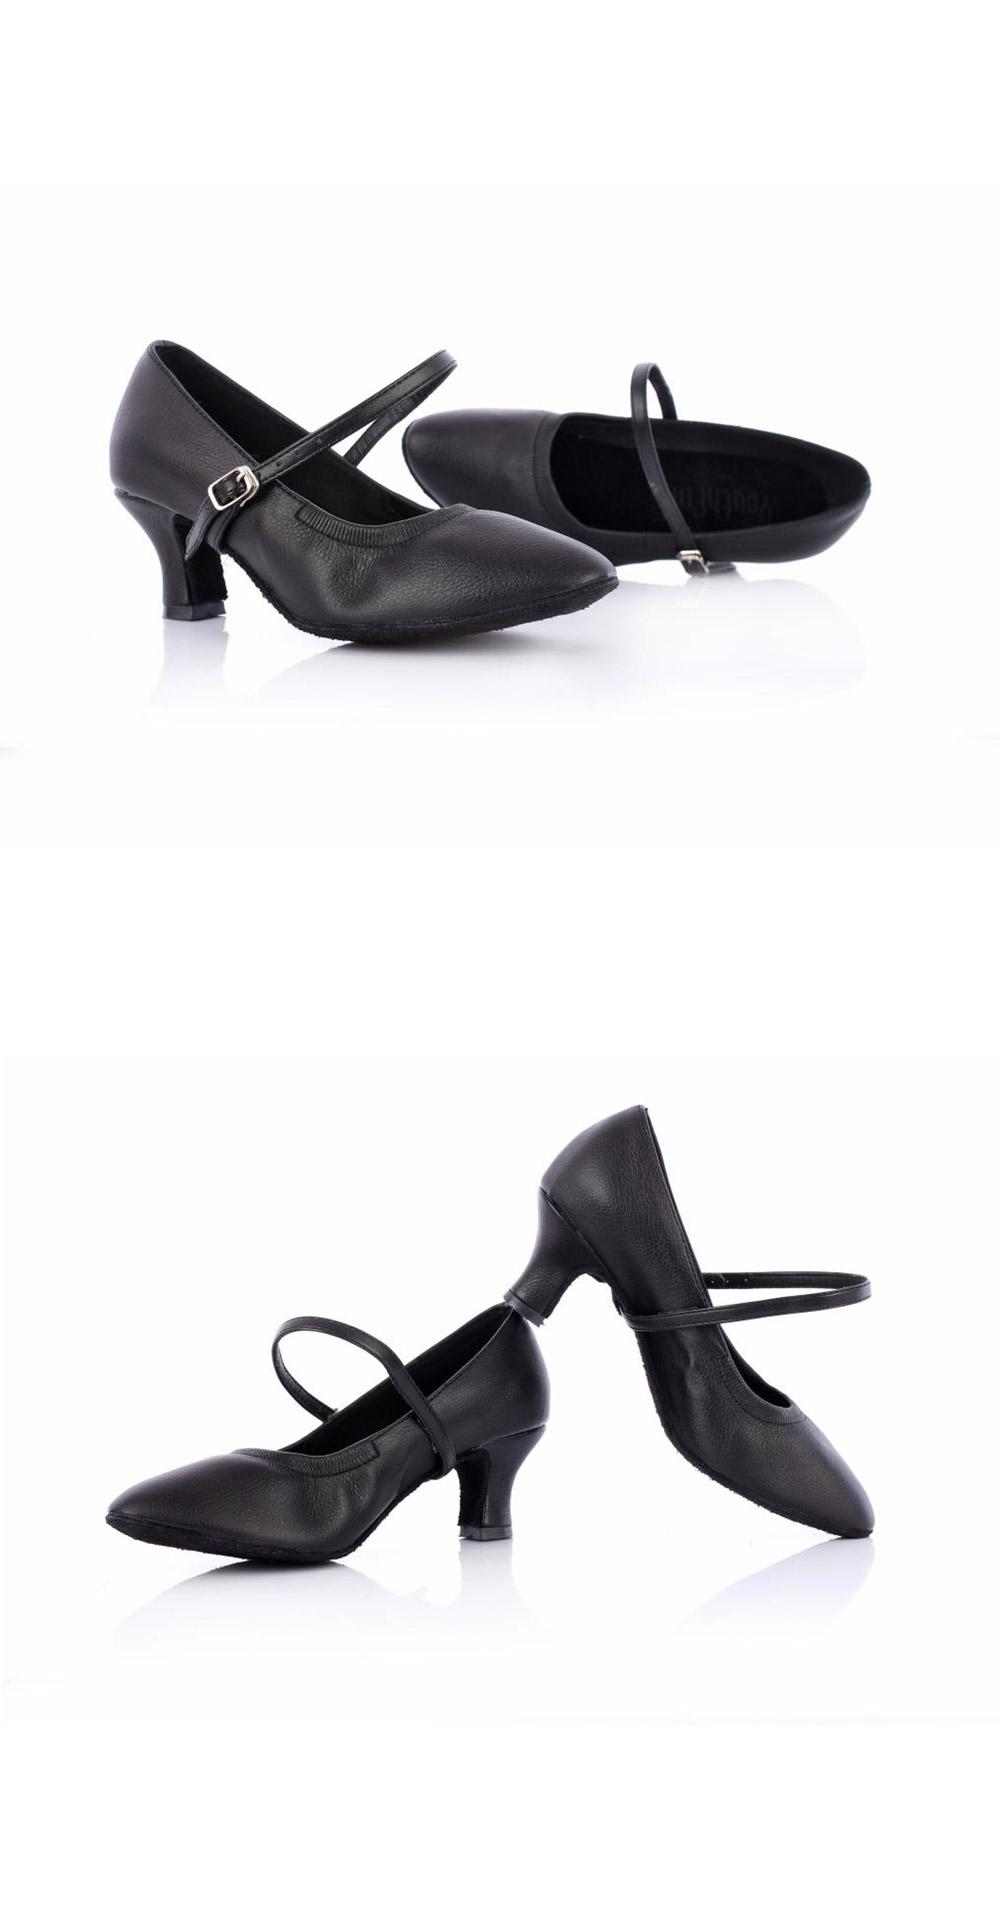 Hot Selling Latin Dancing Shoes For Women Soft Bottom Tango Shoes 57Cm Modern Salsa Dance Shoes Female Ballroom Dancing Shoes (11)